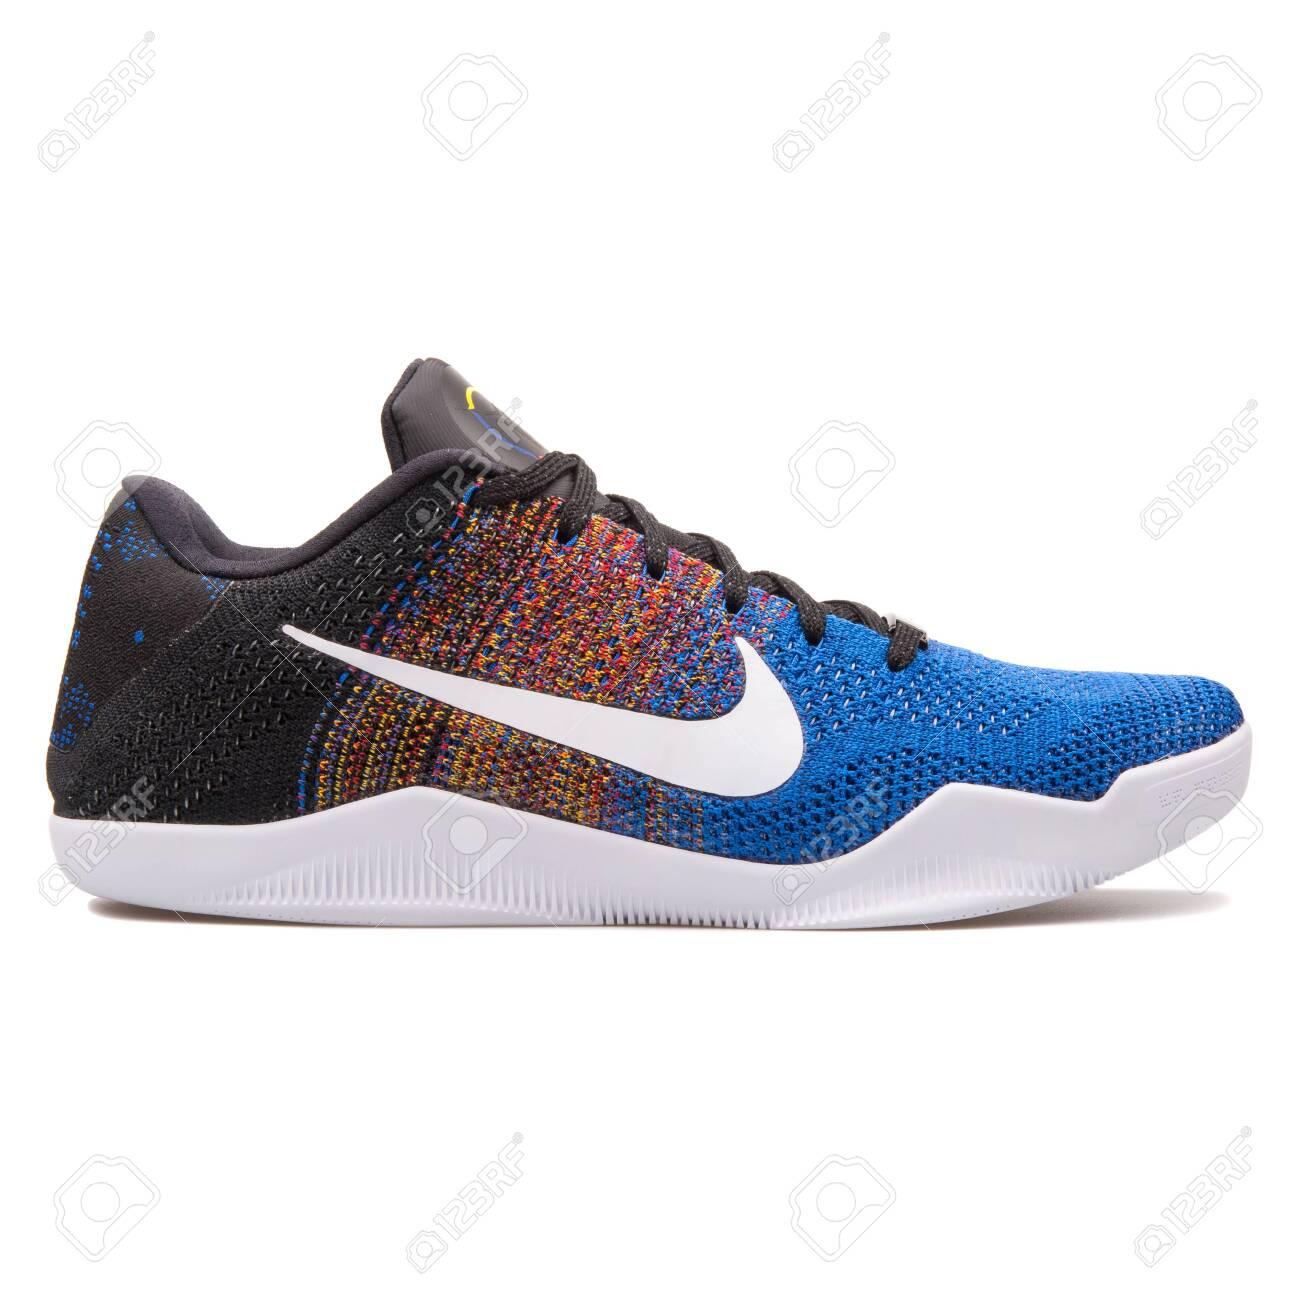 Nike Kobe XI Elite Low Blue,.. Stock